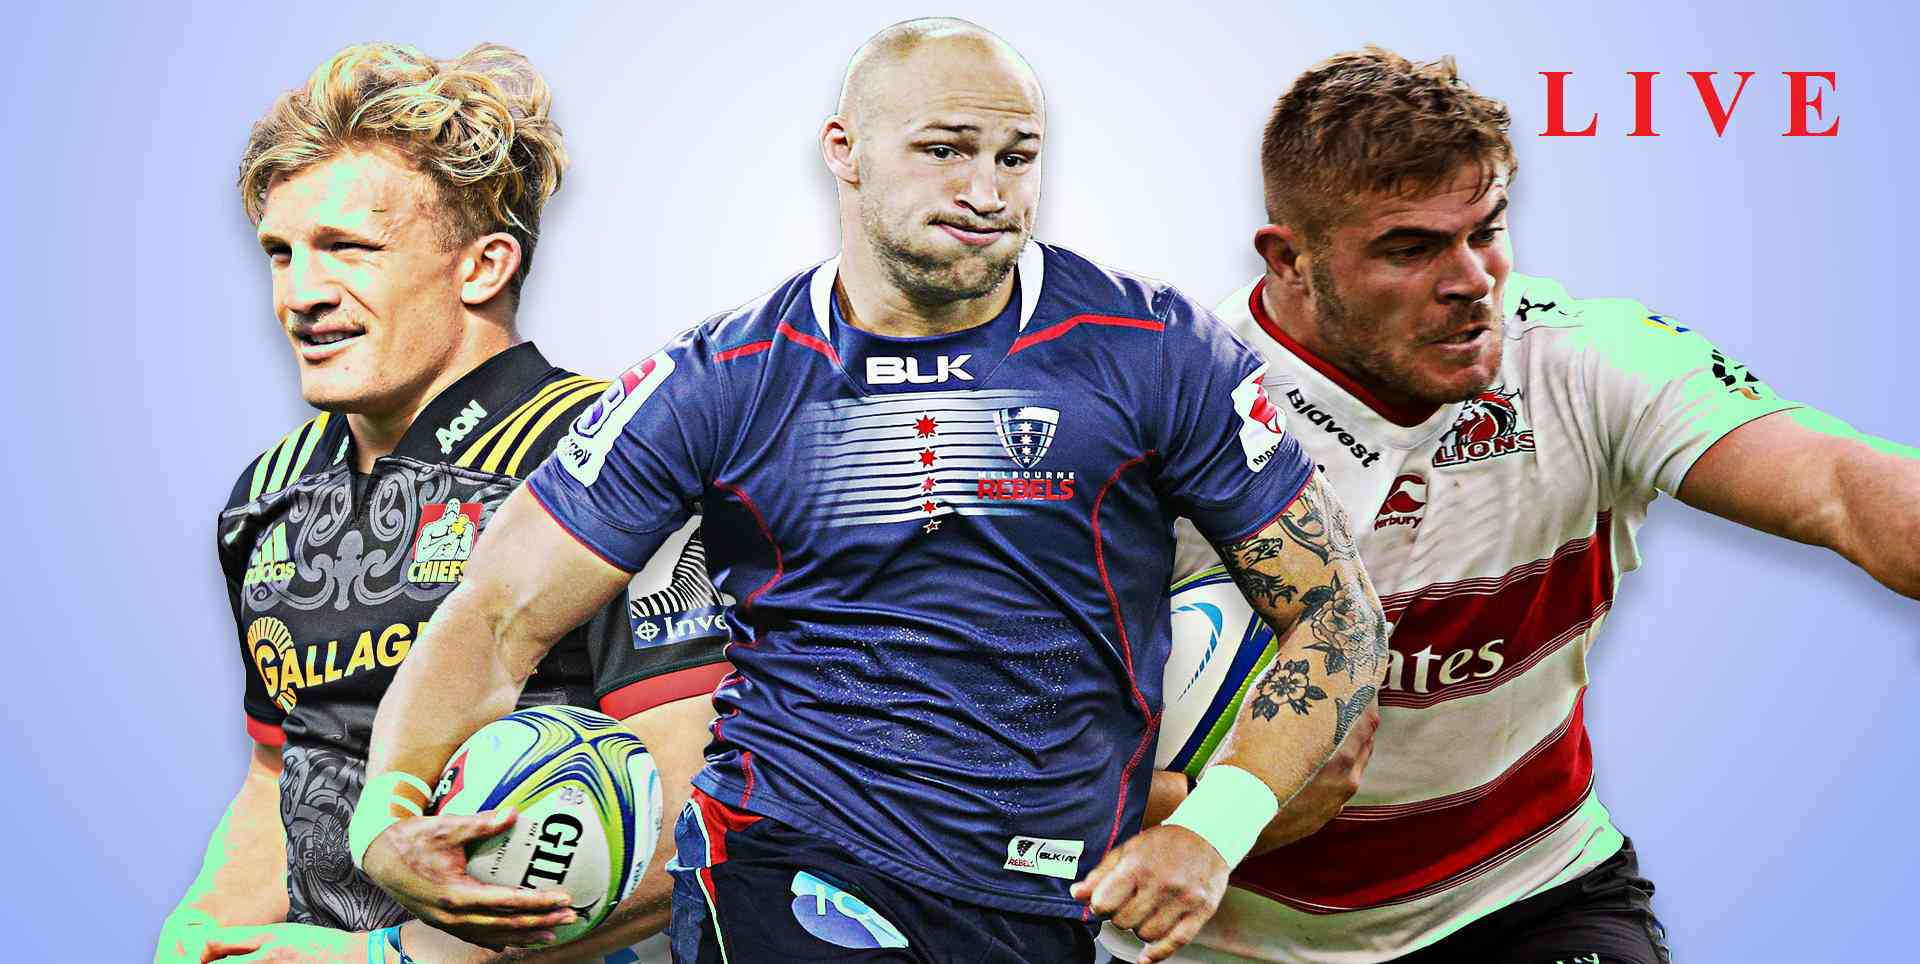 lions-vs-bulls-2018-rugby-live-online